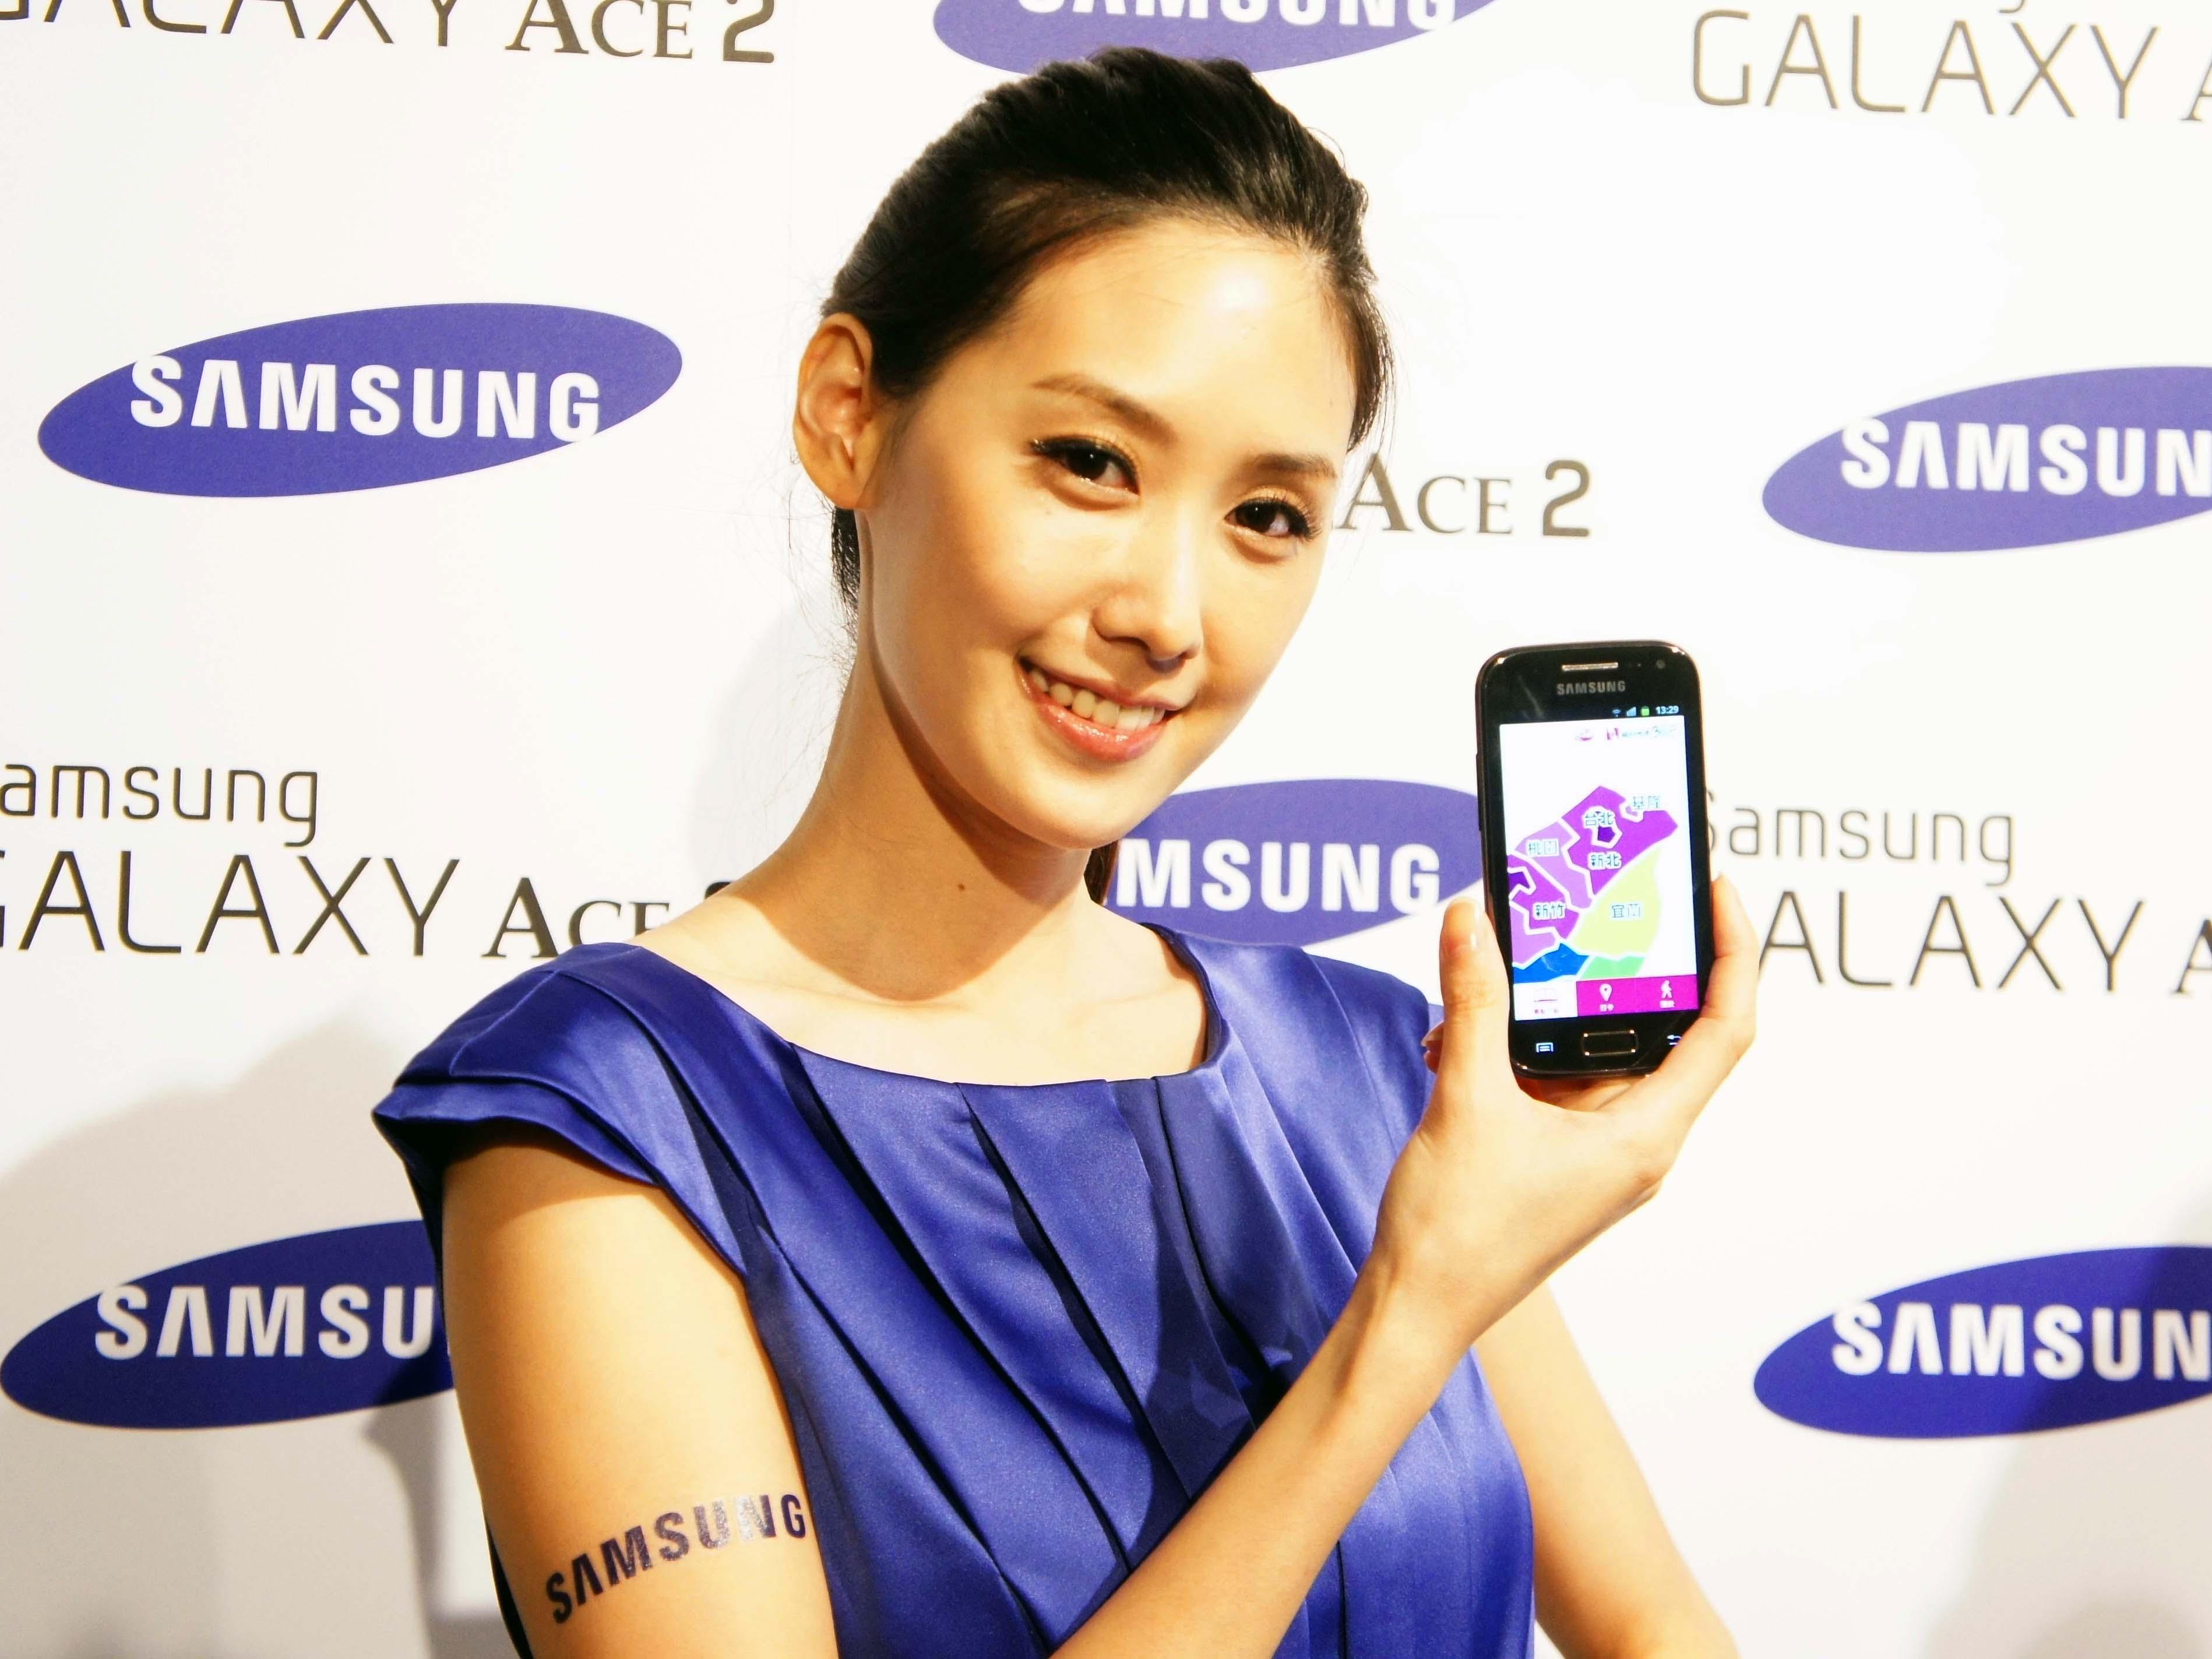 Samsung Galaxy Ace 2 入門雙核機,8,900元平價開賣